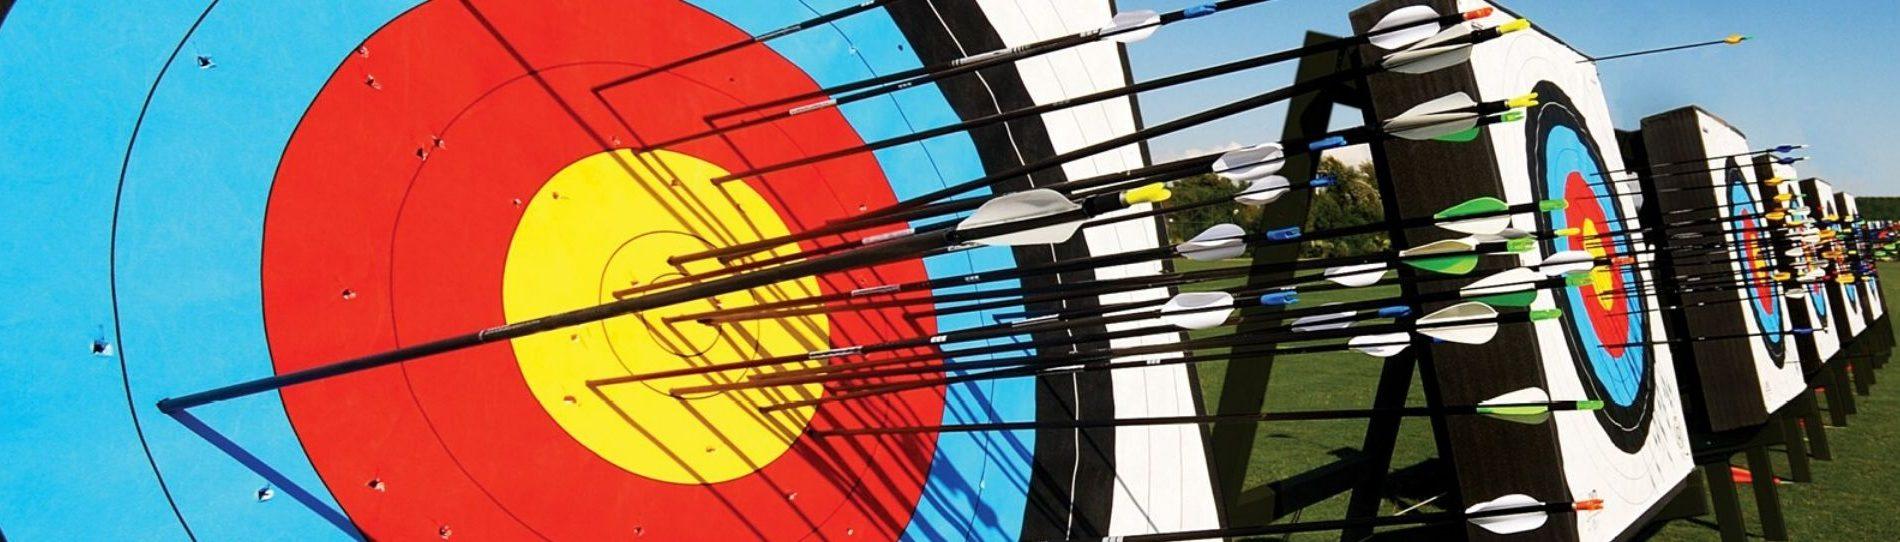 queenstown archery tag activity